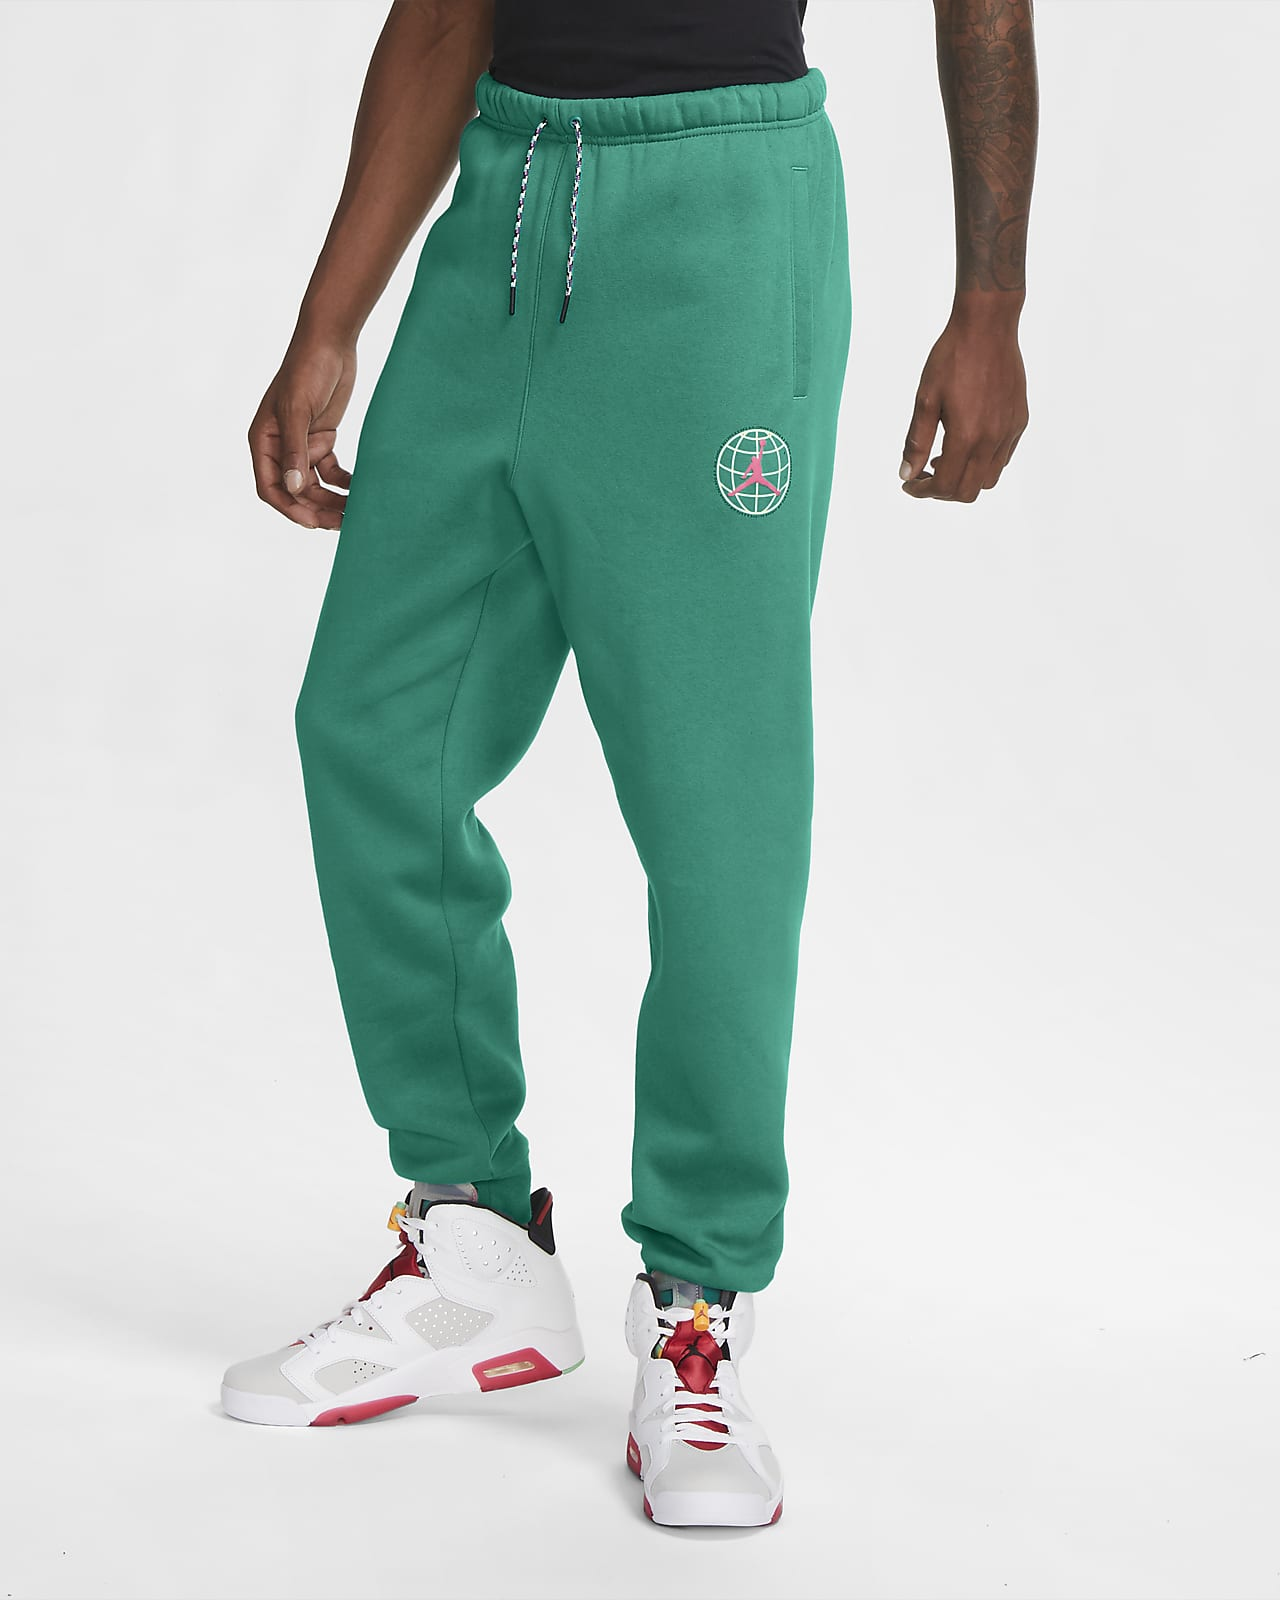 Pantalones de tejido Fleece para hombre Jordan Winter Utility